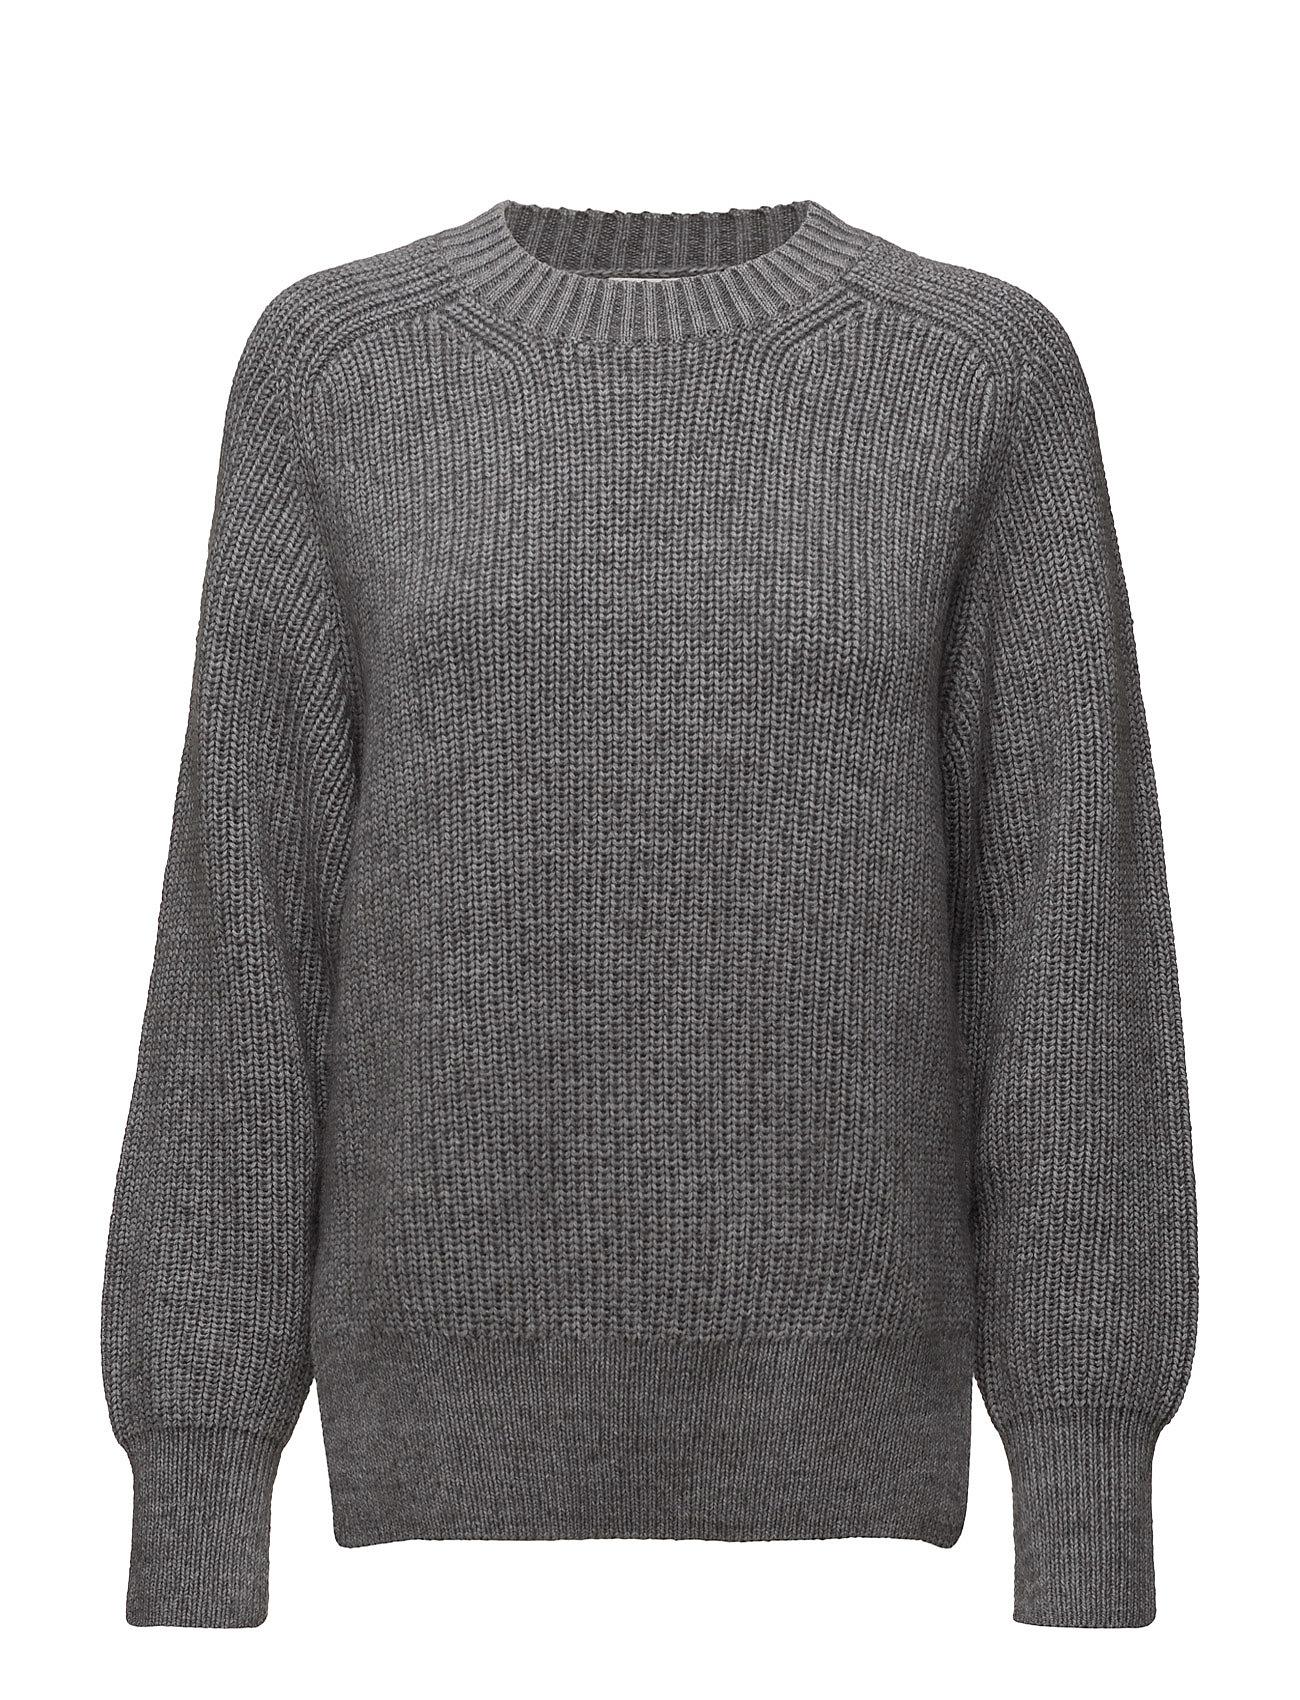 3.1 phillip lim Mohair wool rib saddle crewneck po fra boozt.com dk